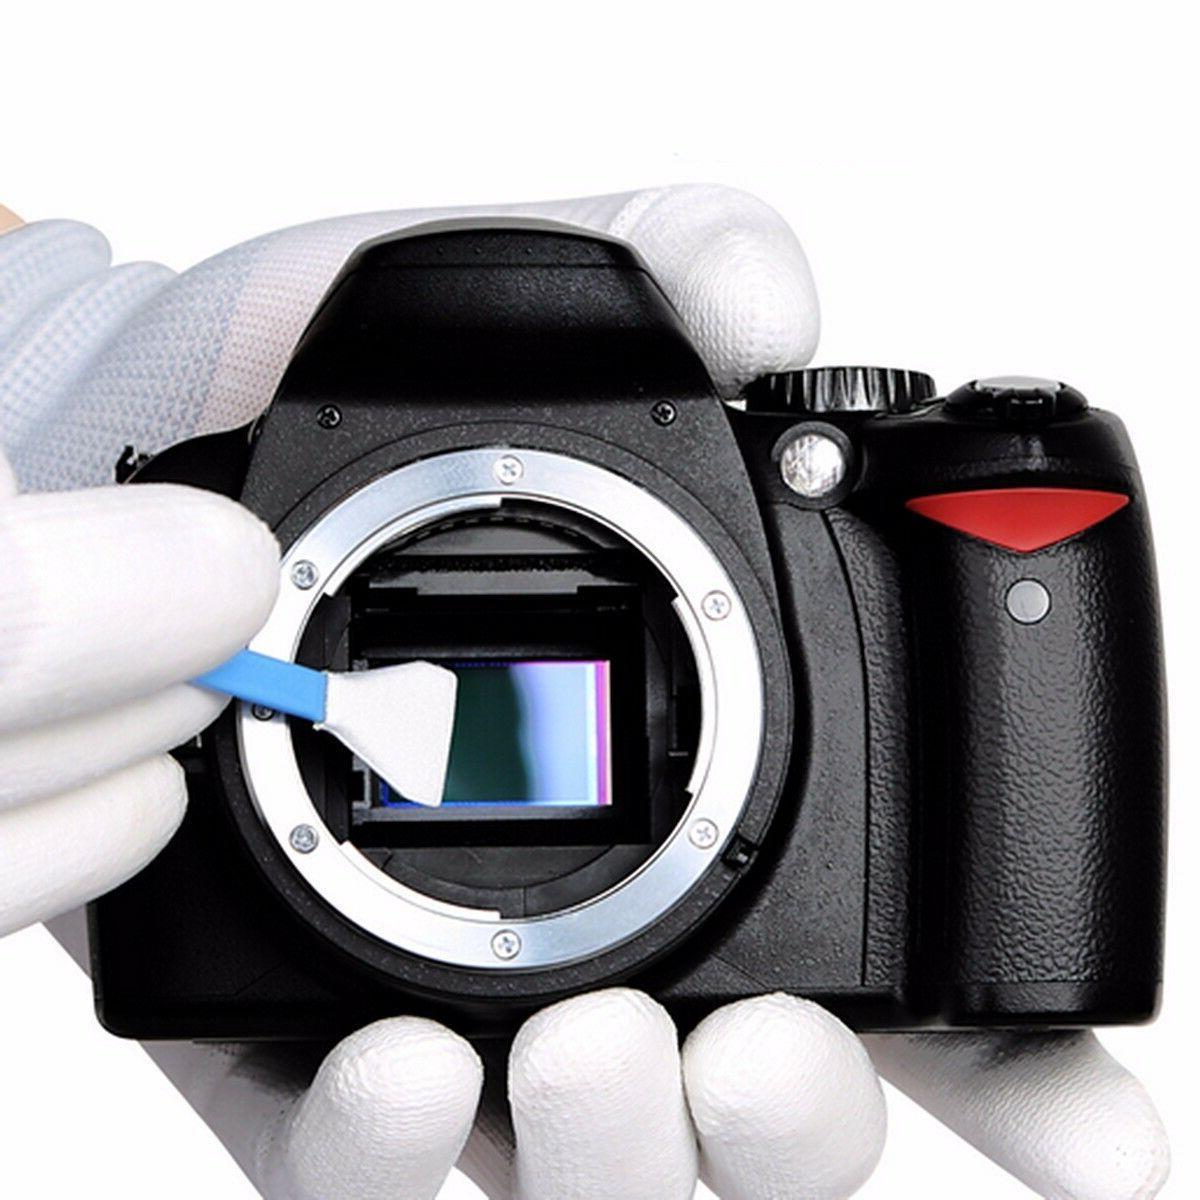 10PCS APS-C CCD/CMOS Cleaning Kit DSLR Camera